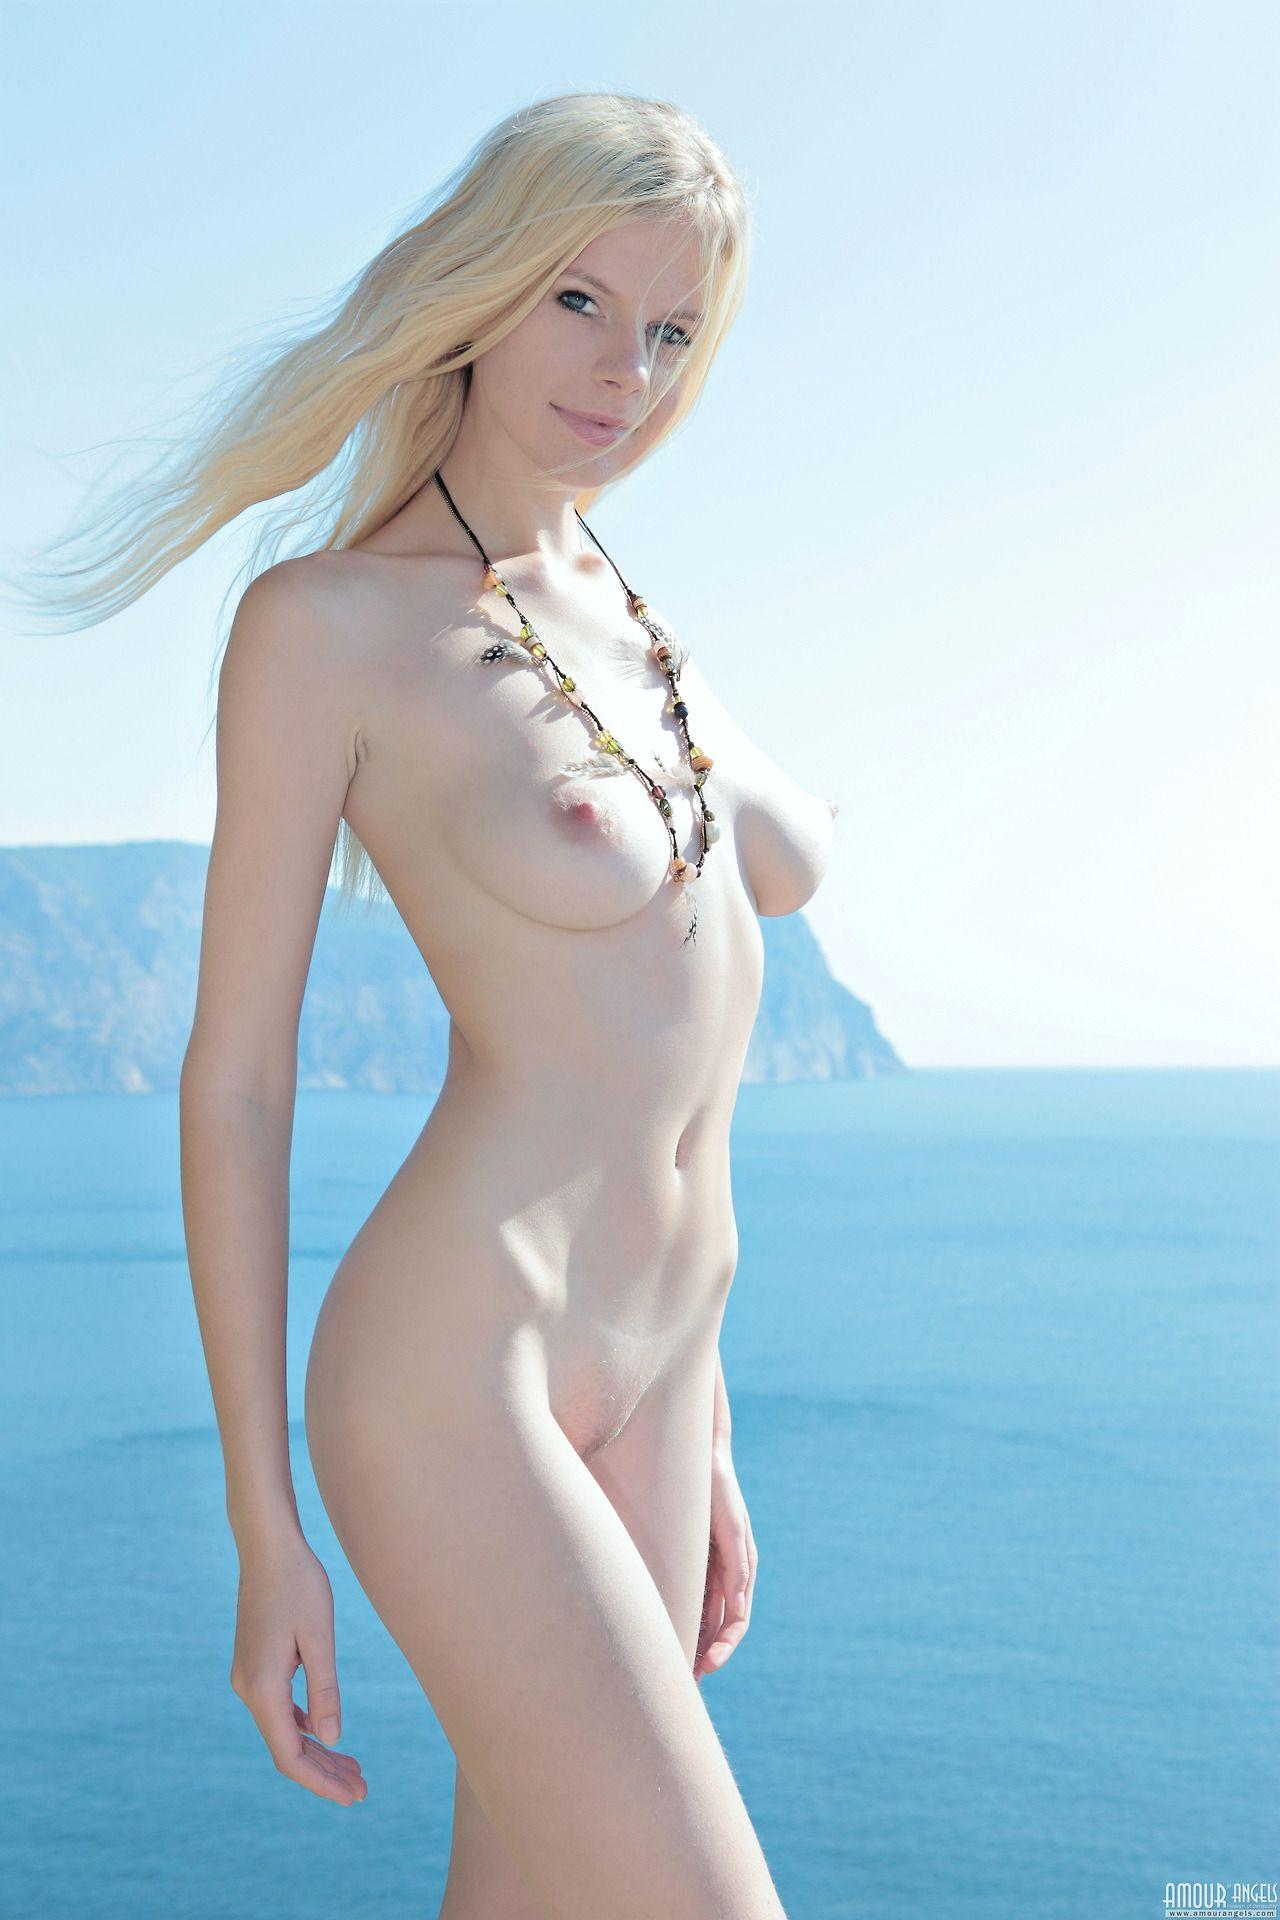 Slate reccomend Hot icelandic girls nude